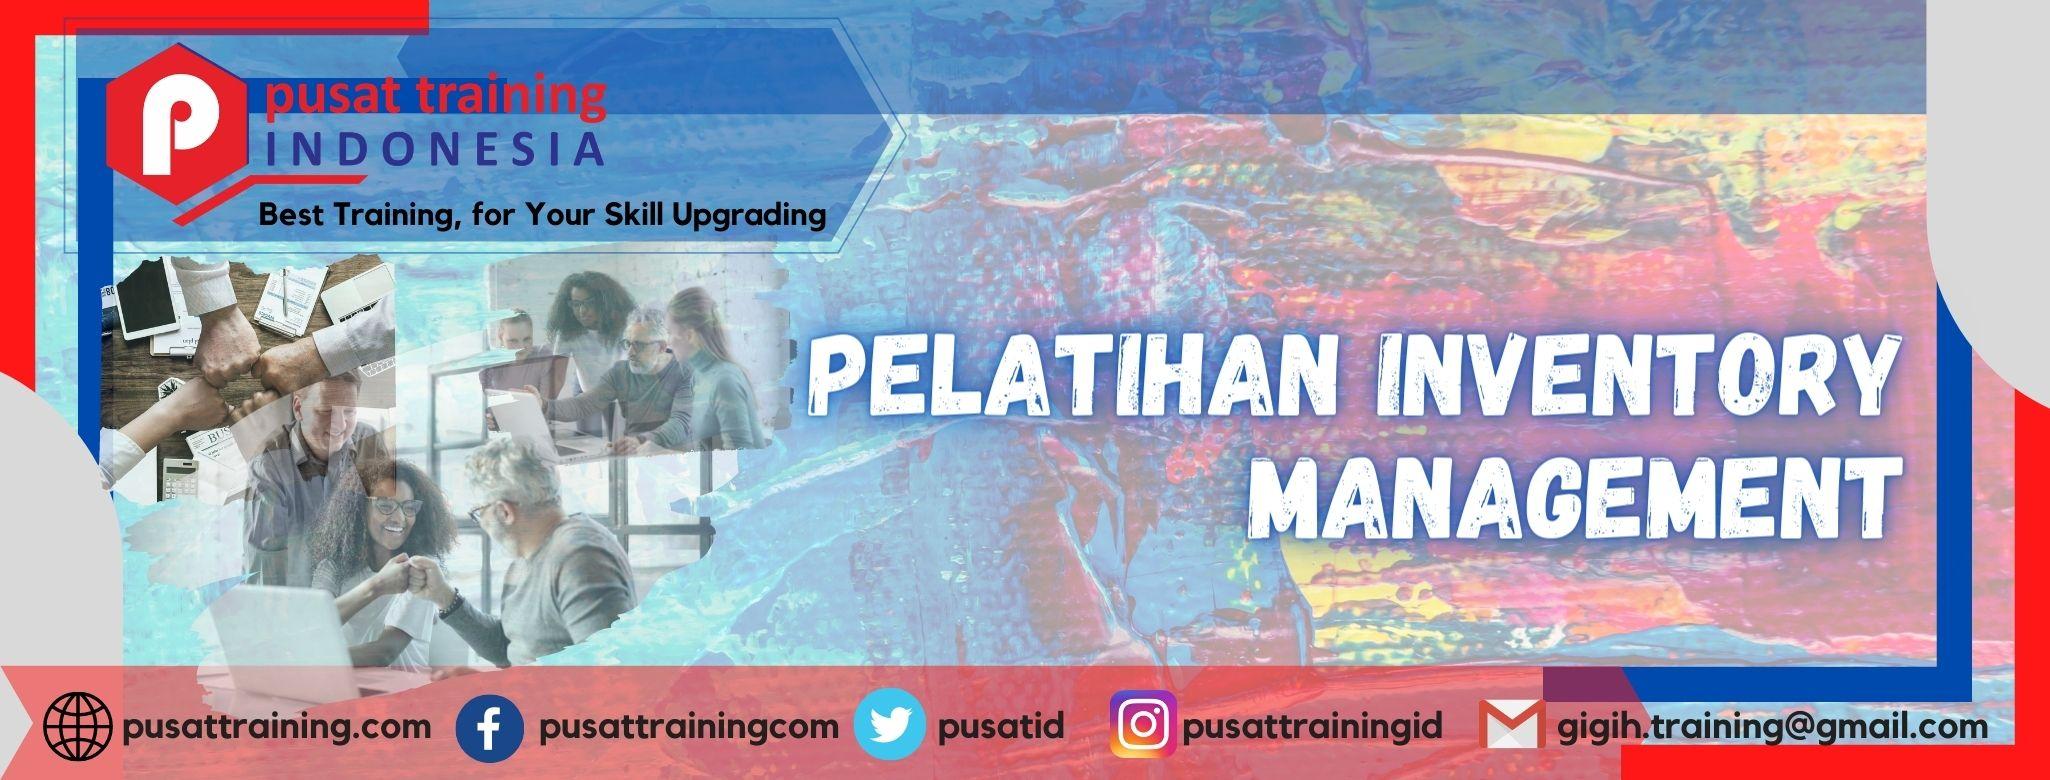 PELATIHAN INVENTORY MANAGEMENT